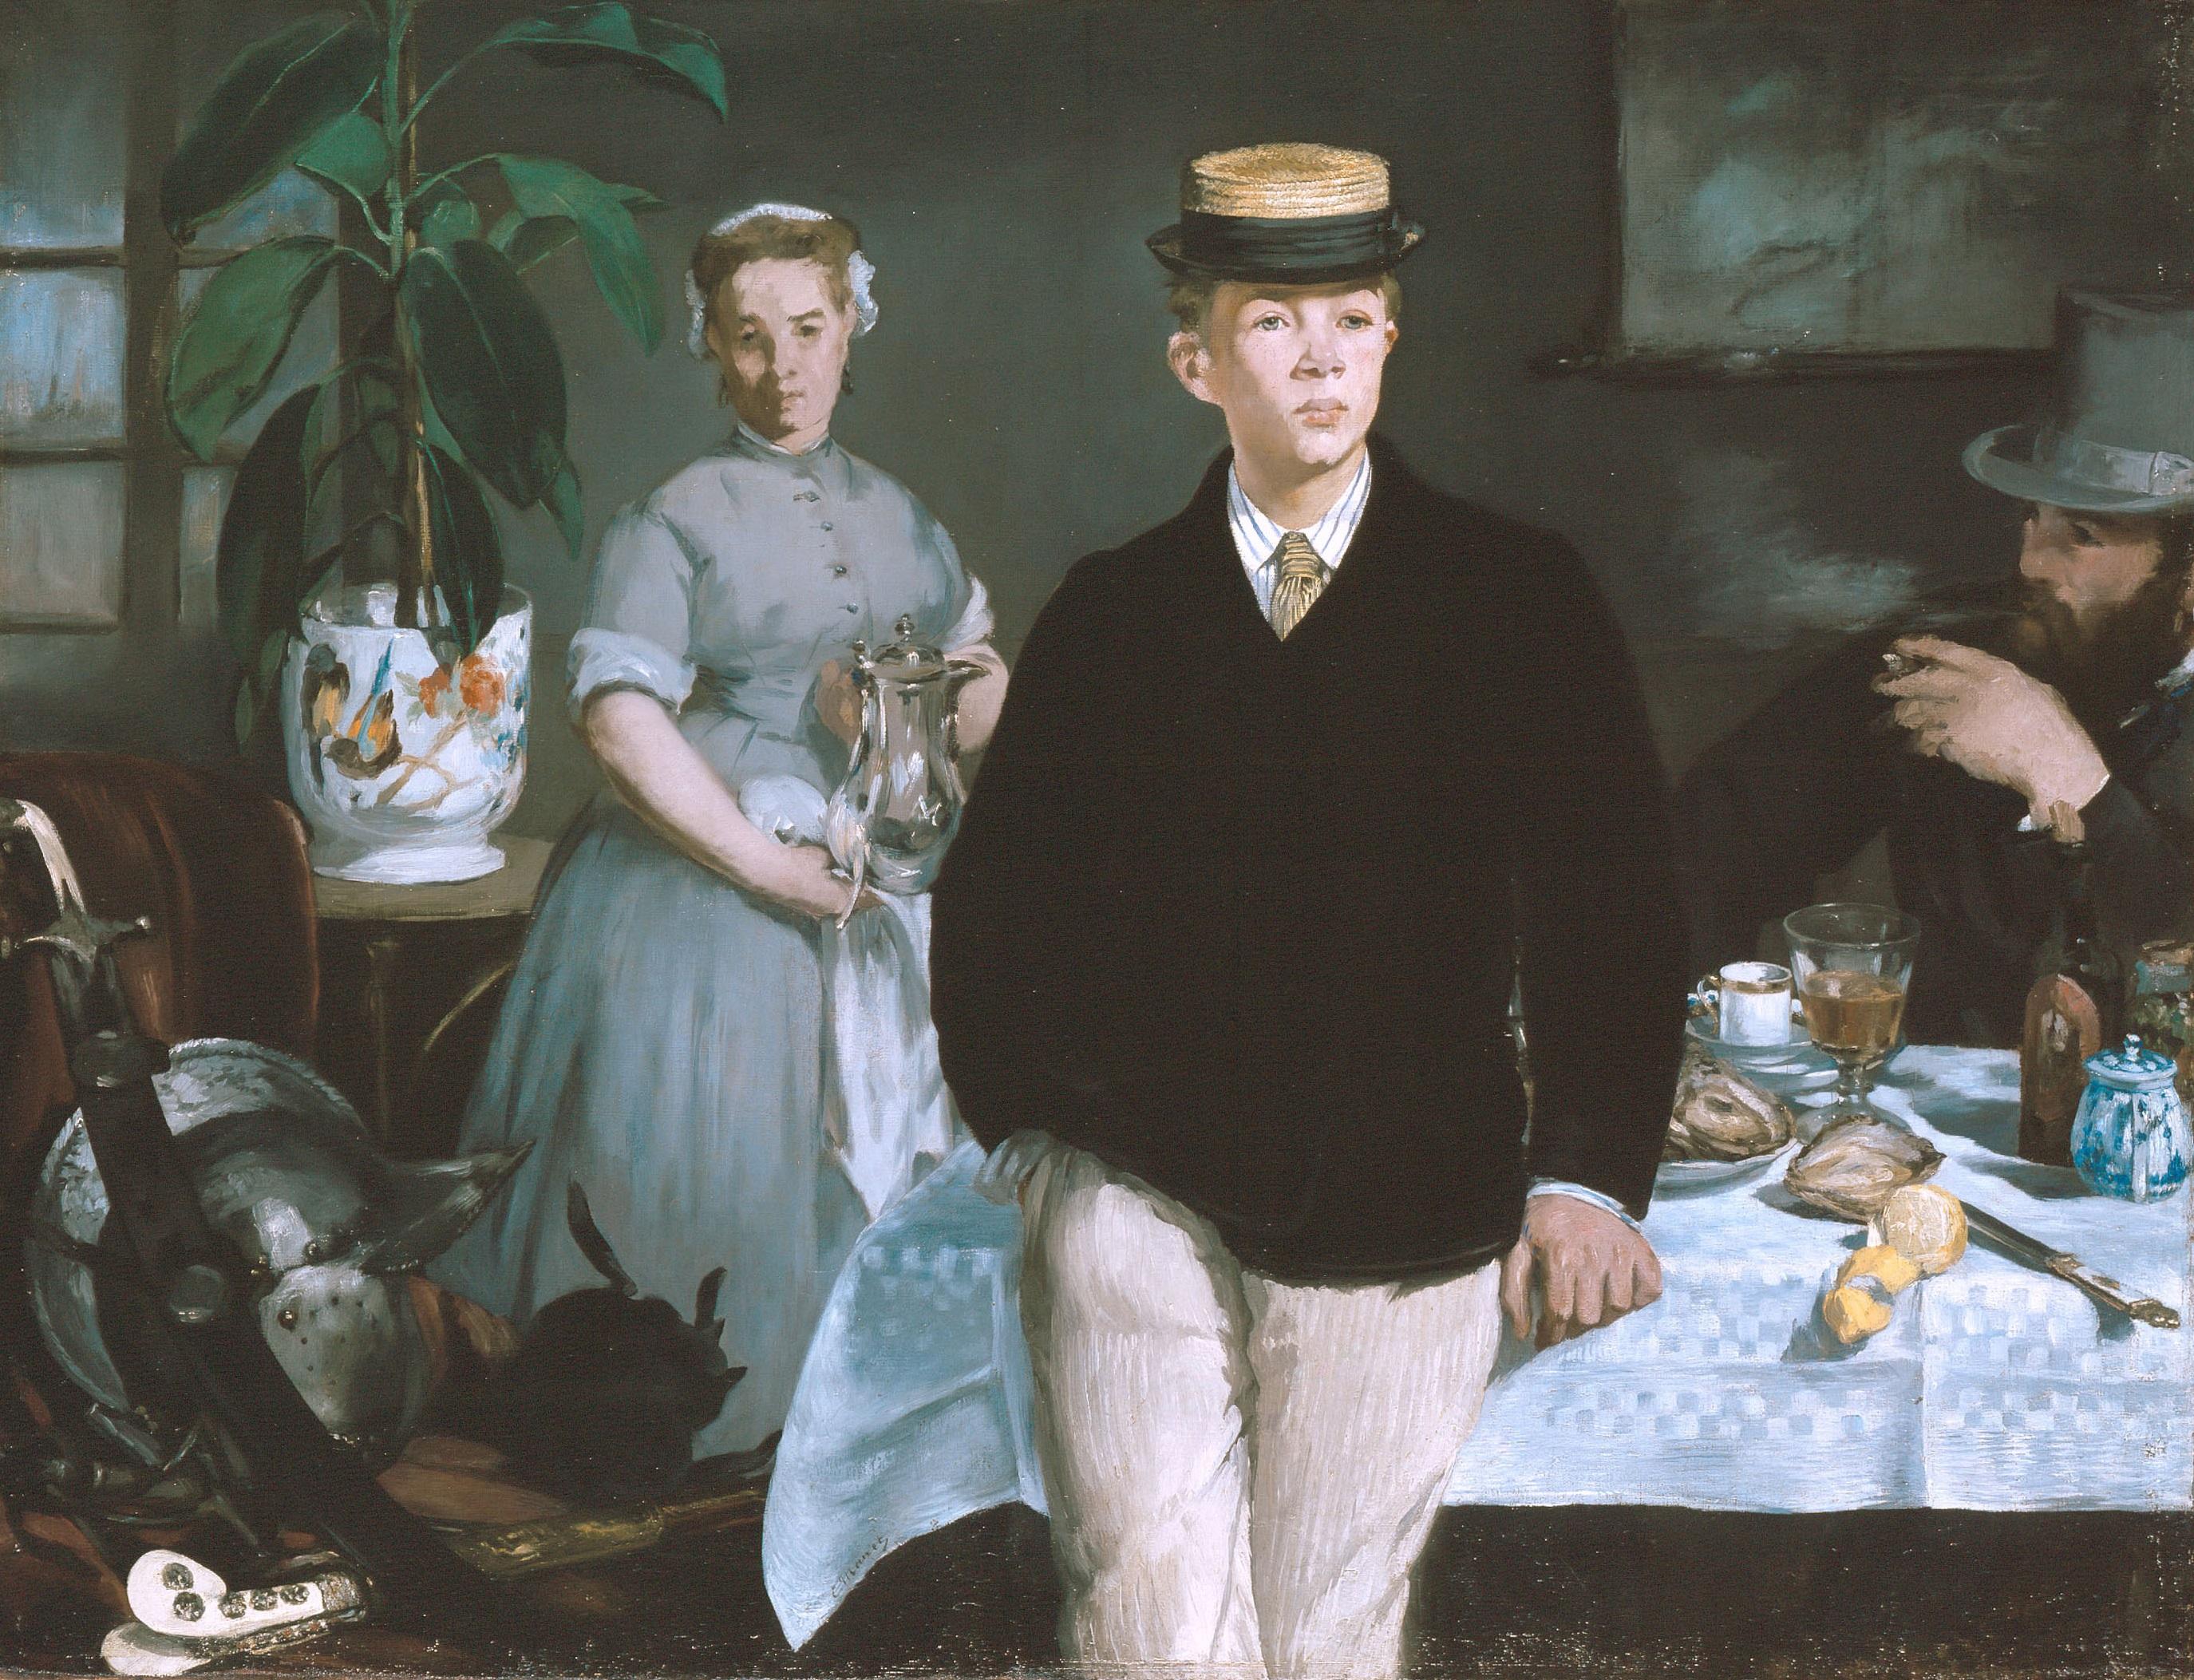 EDOUARD MANET, LE DÉJEUNER, 1868. Leinwand, 118,3 x 154,0 cm. © Bayerische Staatsgemäldesammlungen, Neue Pinakothek, München